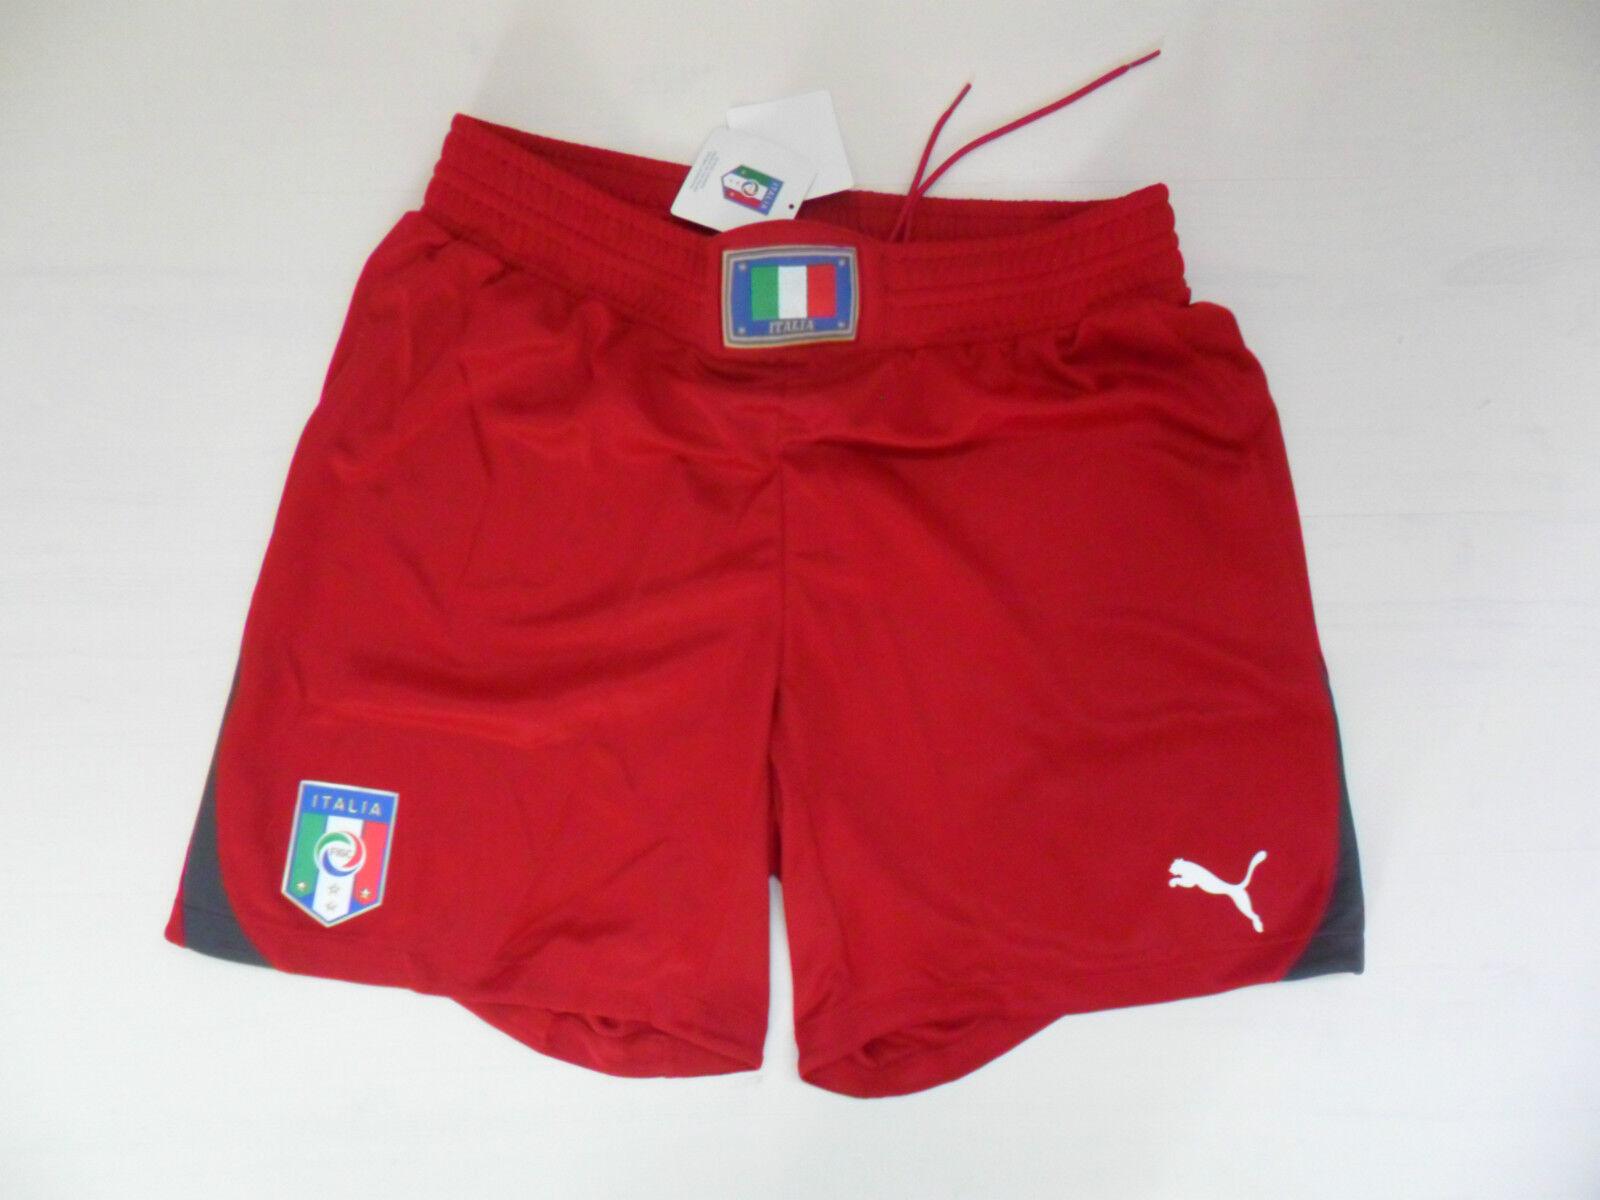 0733bis tg XXL Italien  Shorts Shorts Torhüter GK Buffon GK Torhüter Shorts 05c688